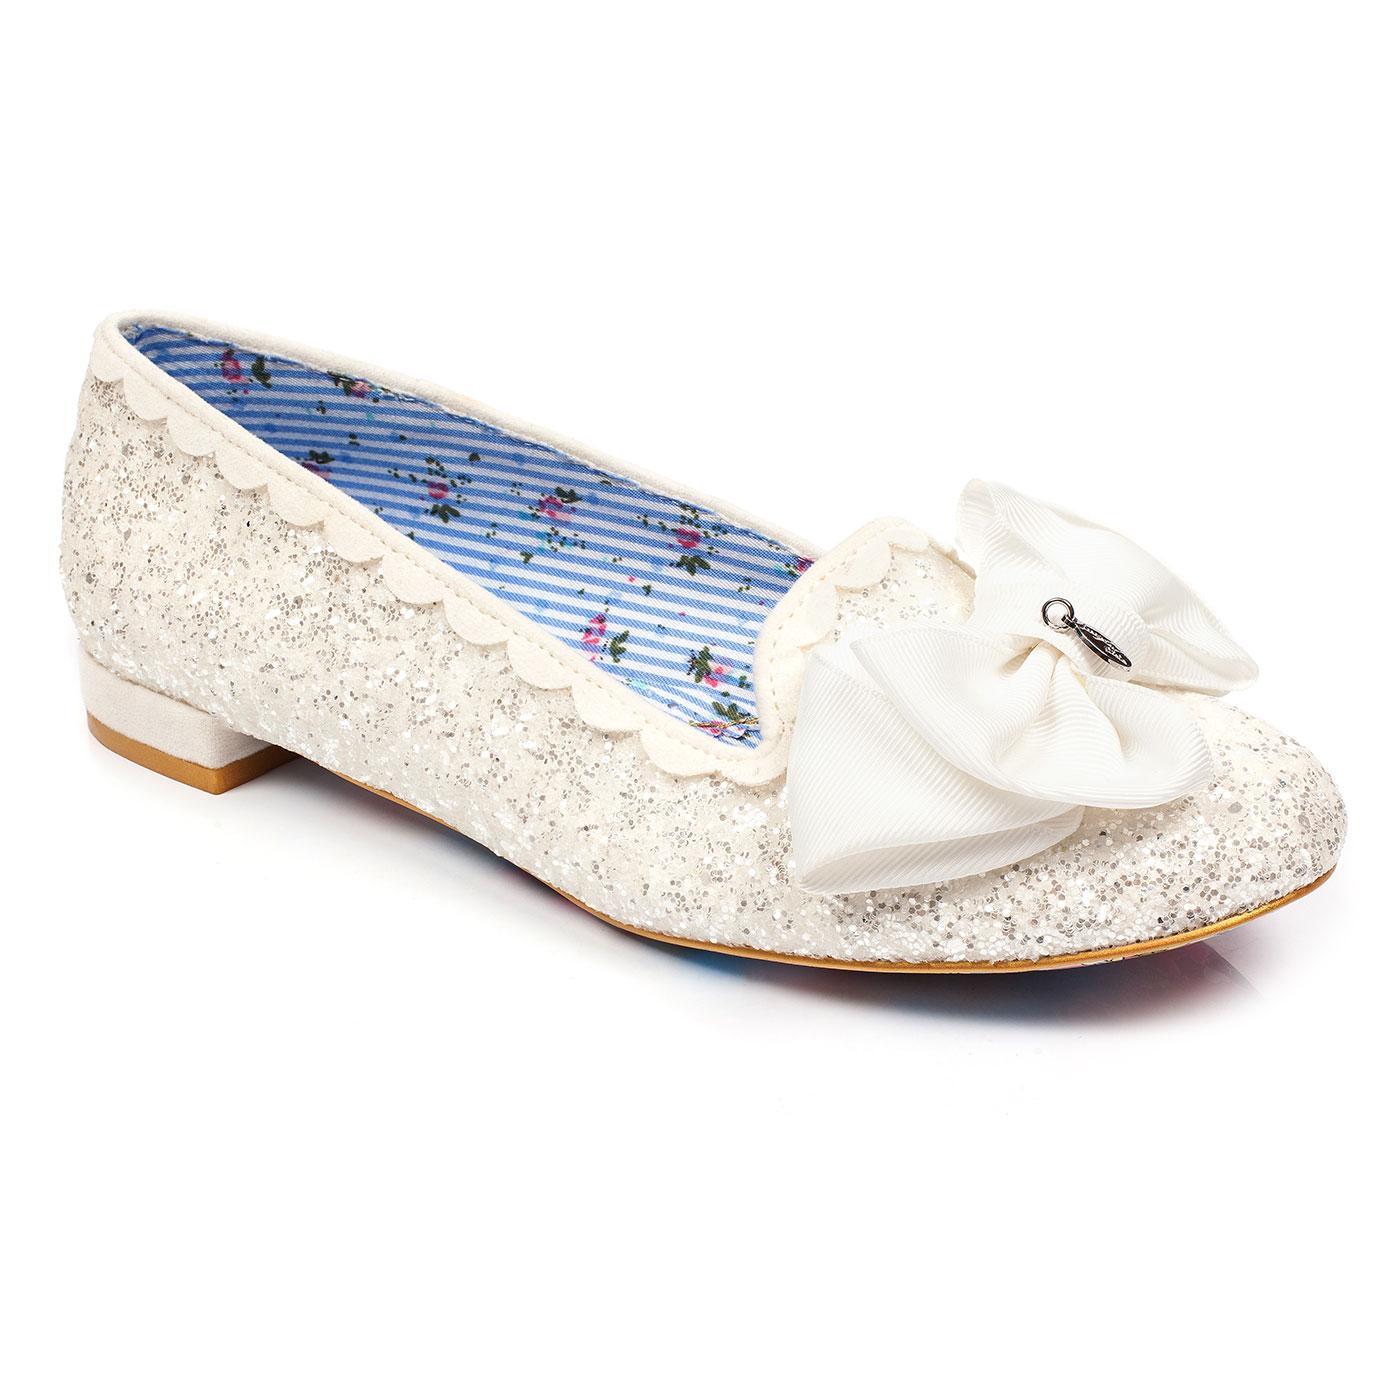 Sulu IRREGULAR CHOICE Vintage Glitter Bridal Flats